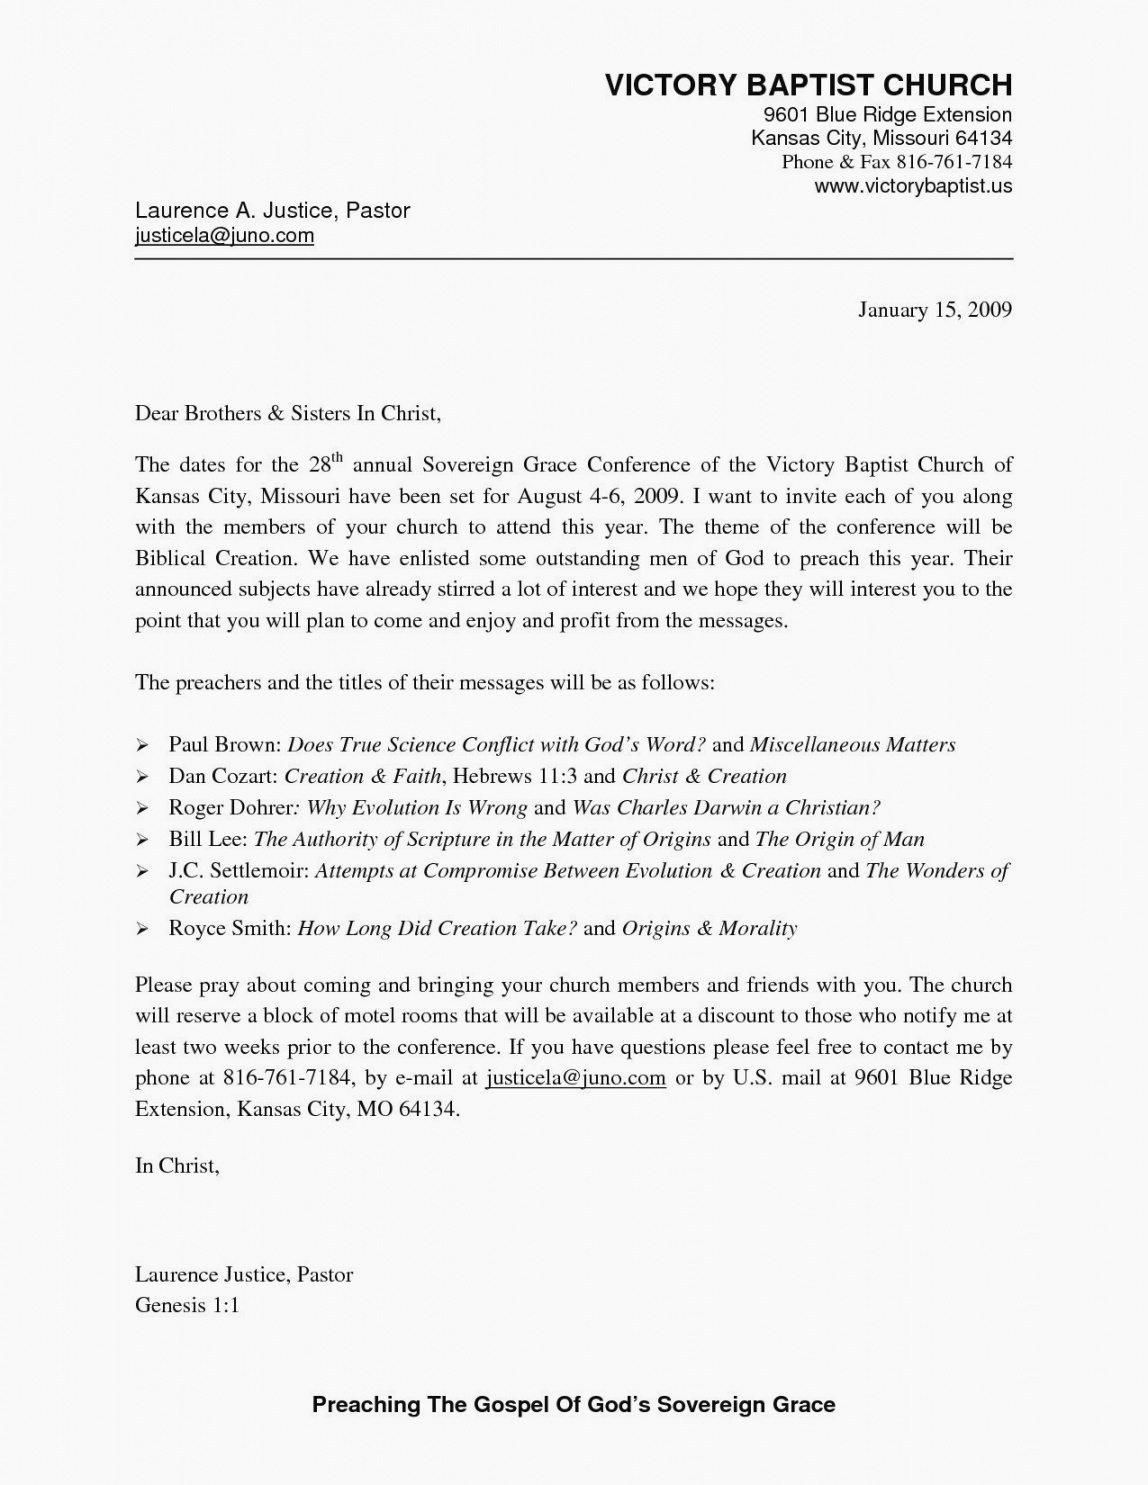 Sample Church Invitation Letter Luxury Church Invitation Letter to Other Churches